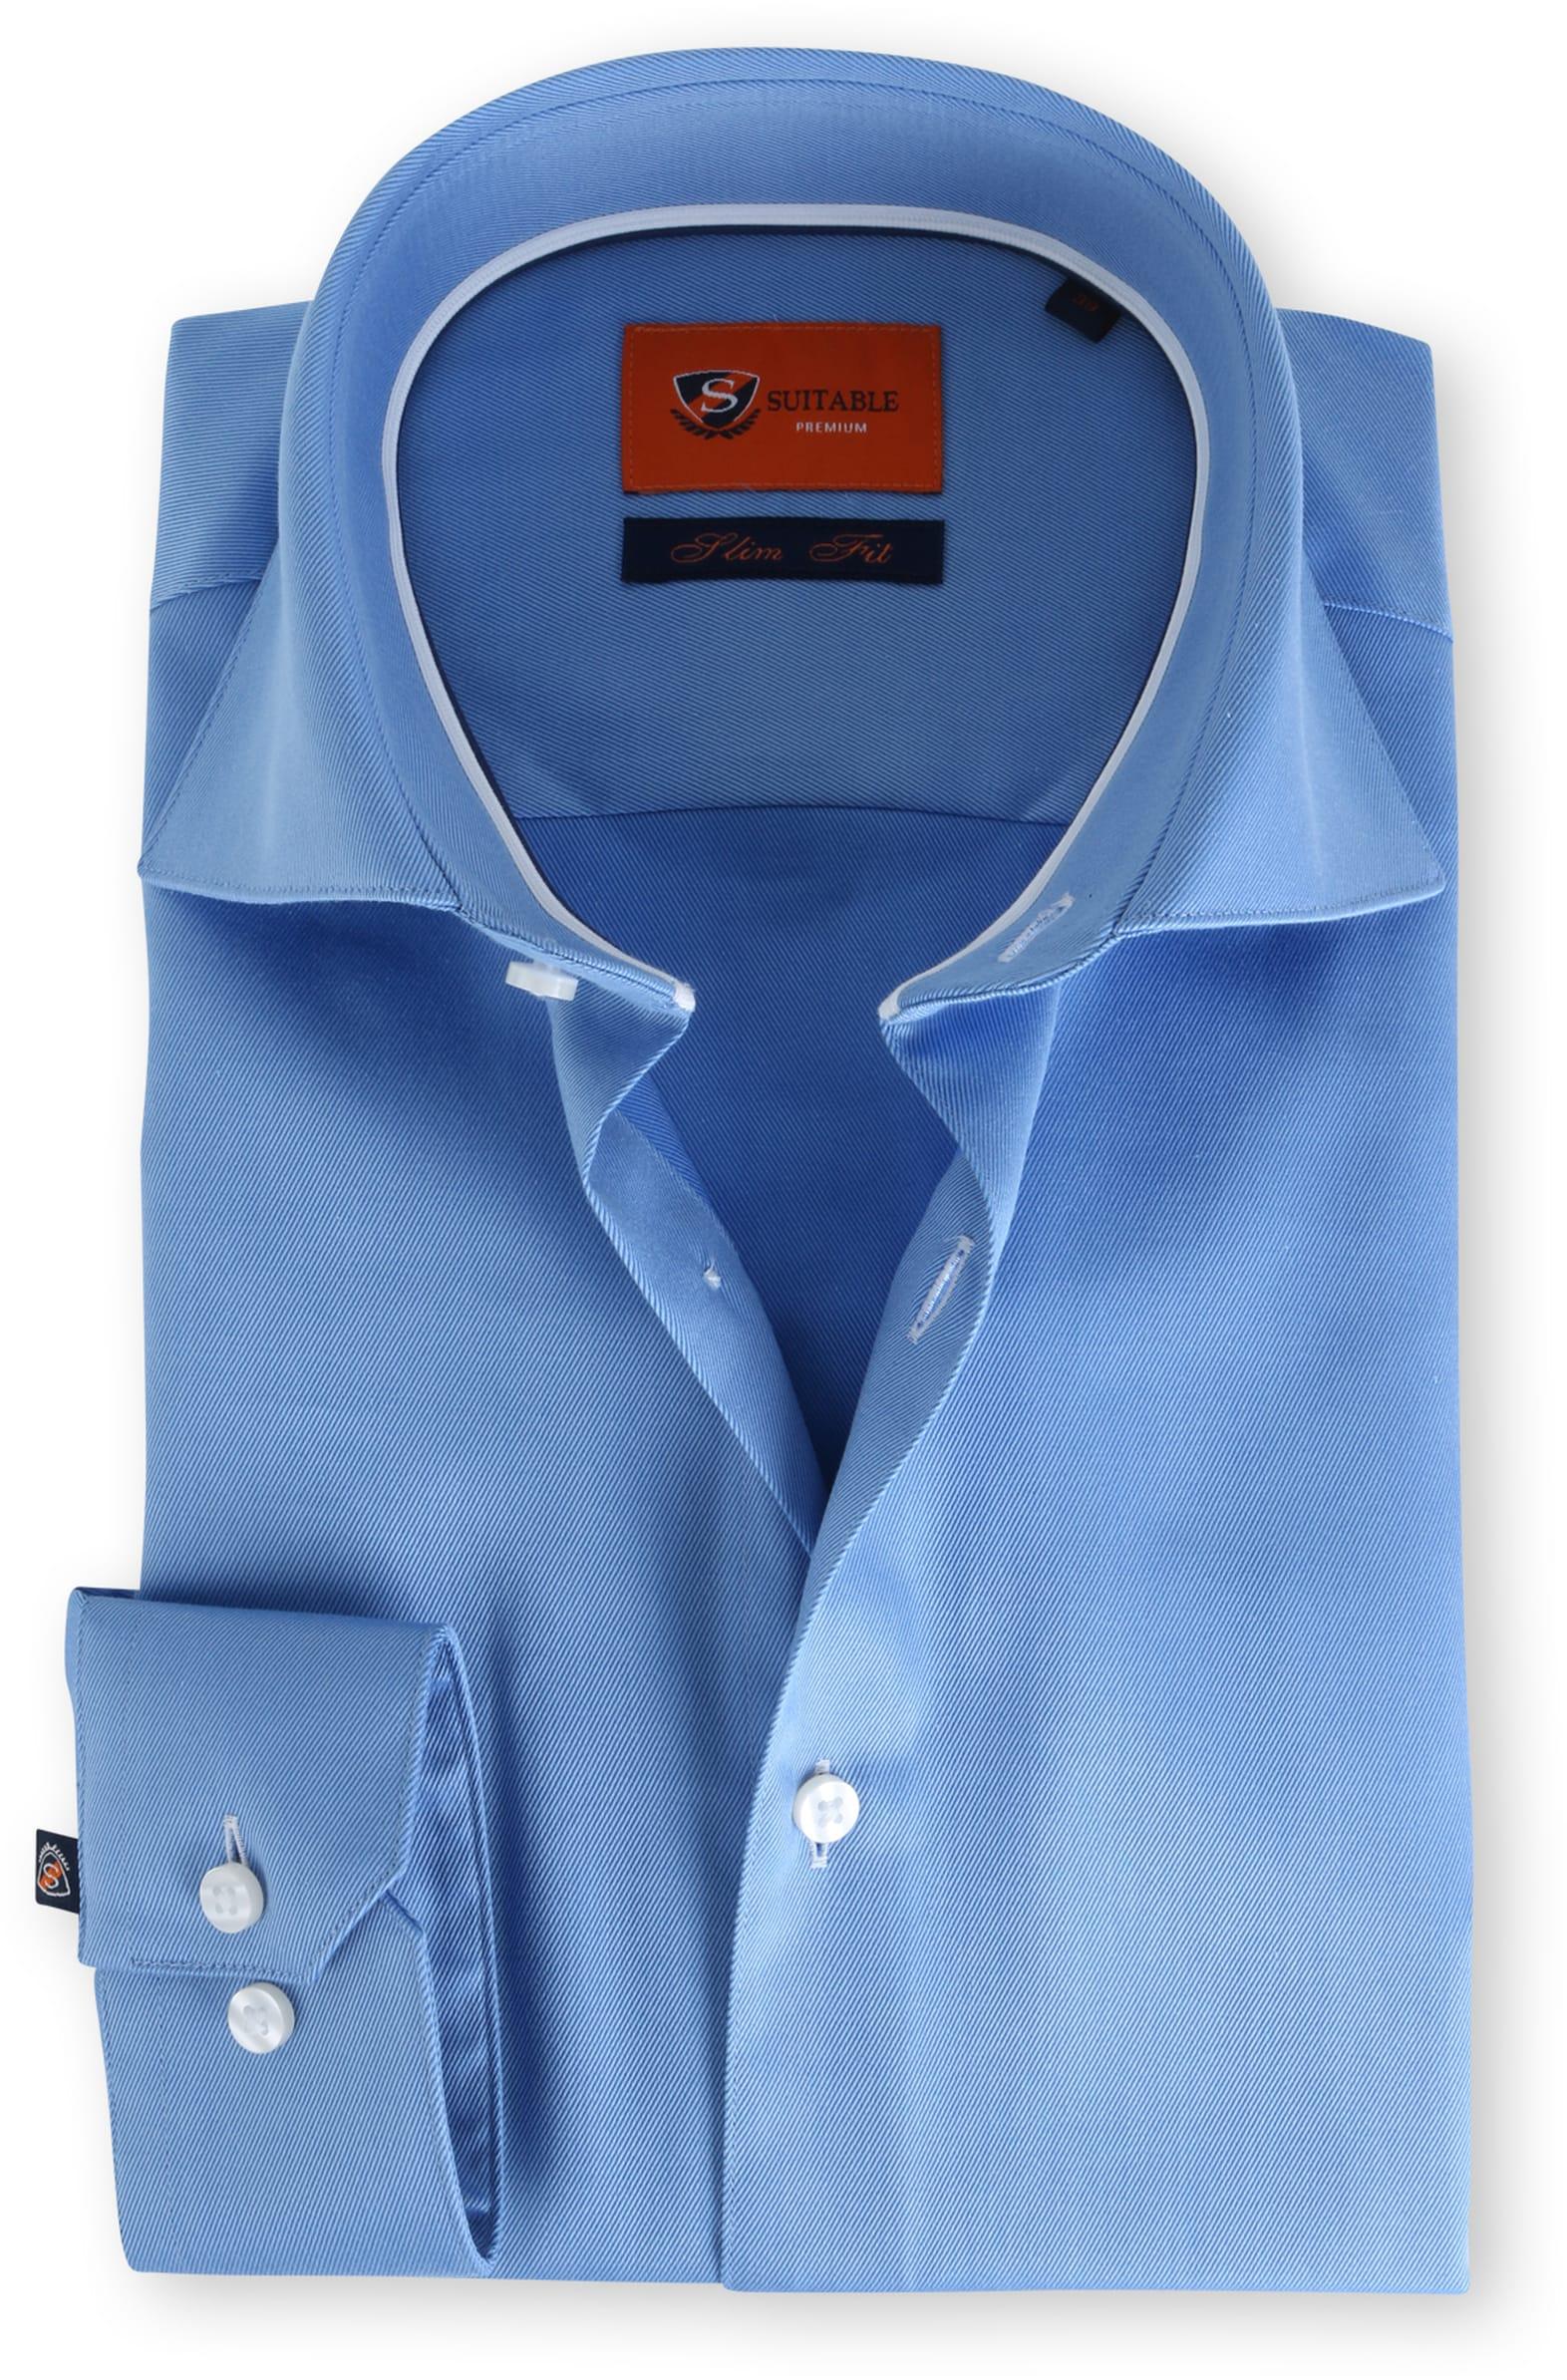 Suitable Blauw Overhemd Slim Fit DR-02 foto 0